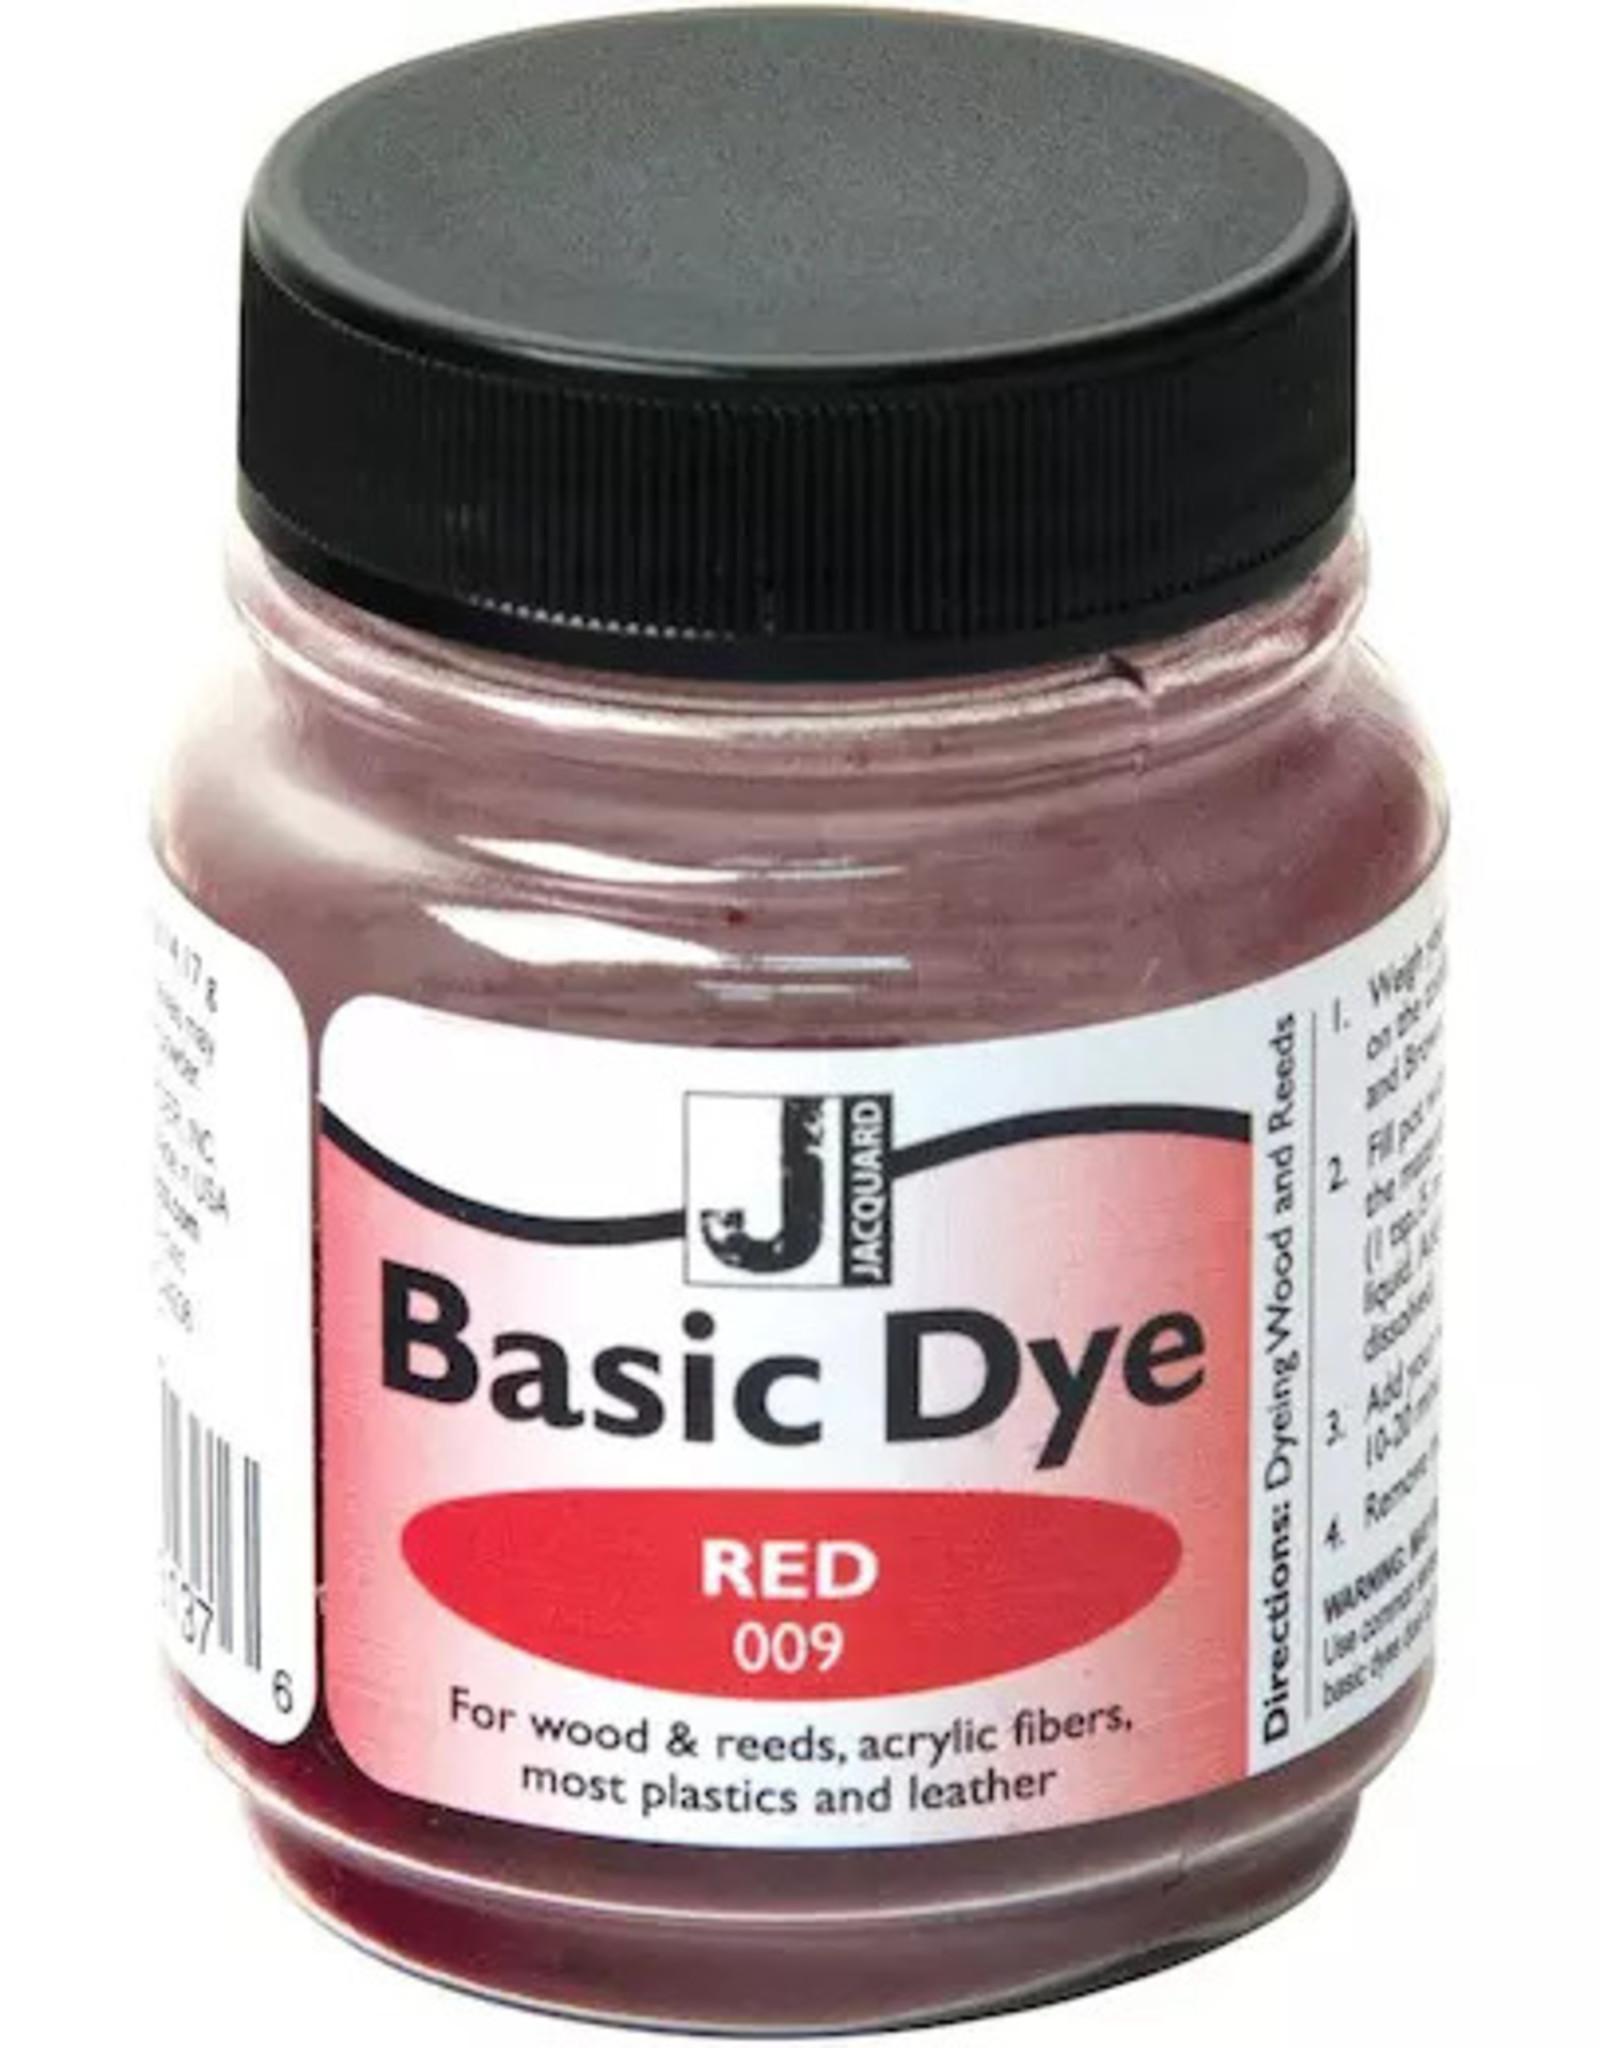 Jacquard Jacquard Basic Dye Red